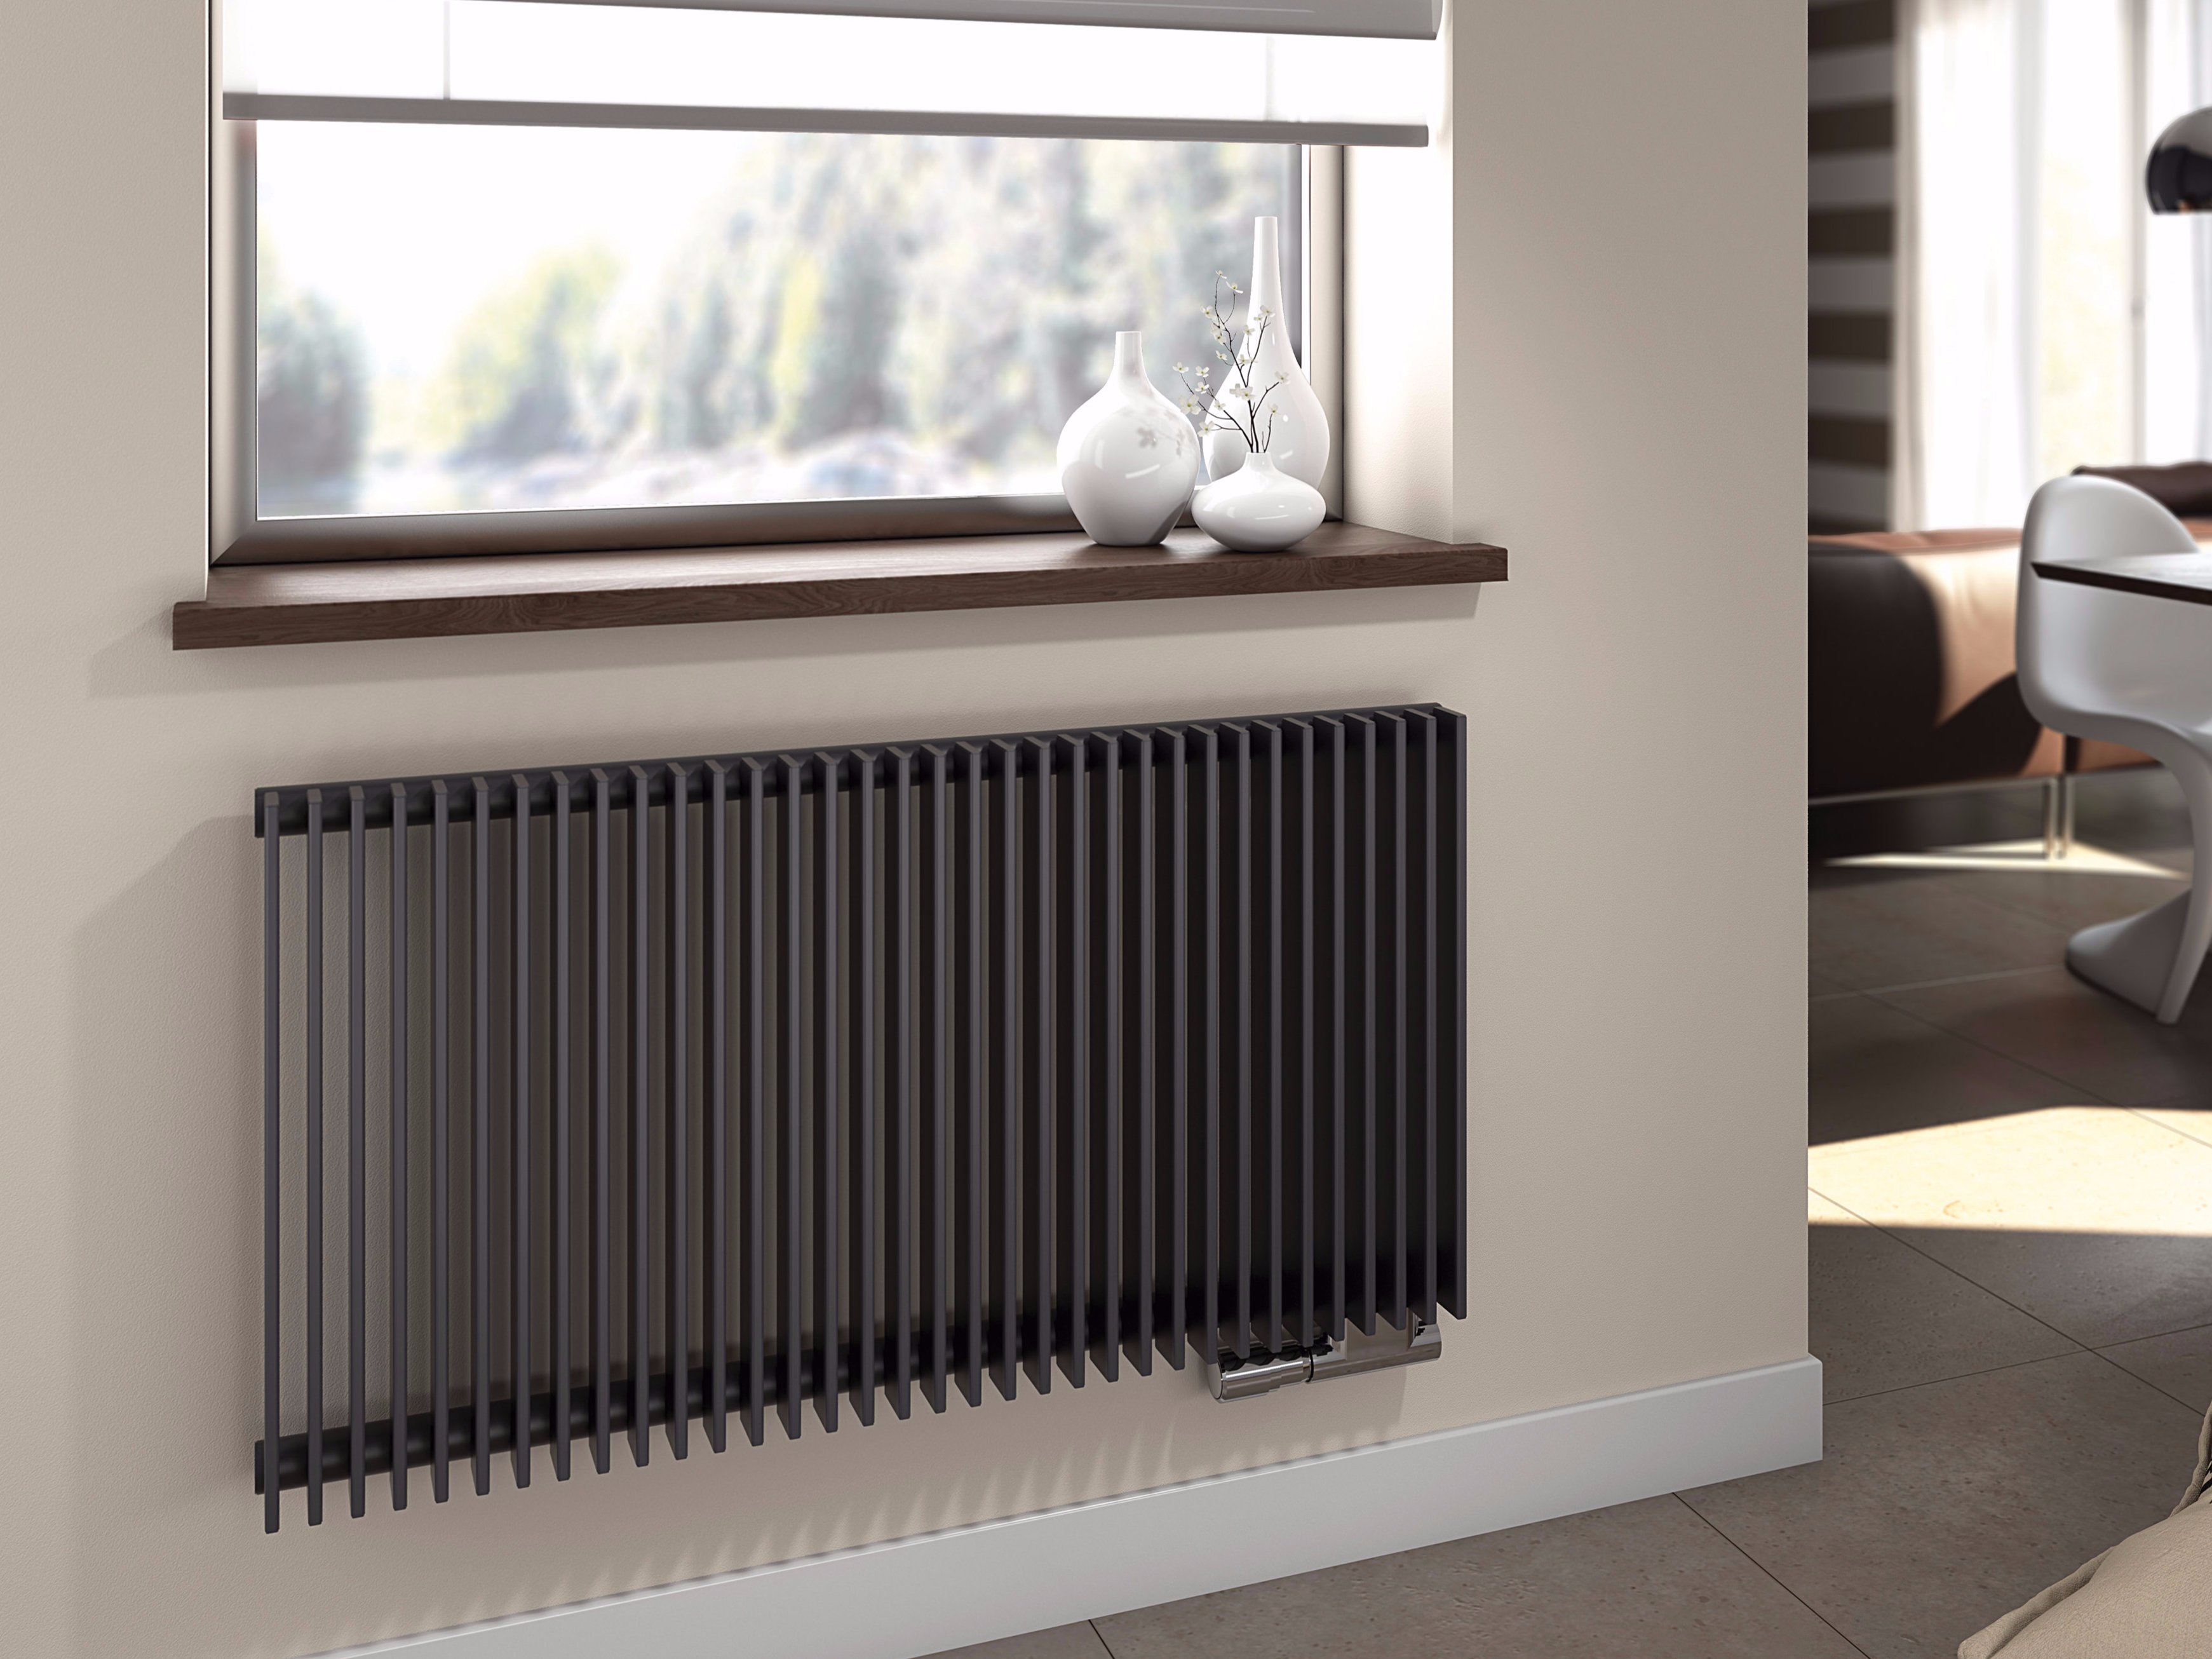 Keira radiatore per sostituzione linea radiatori per - Radiatori ardesia ...